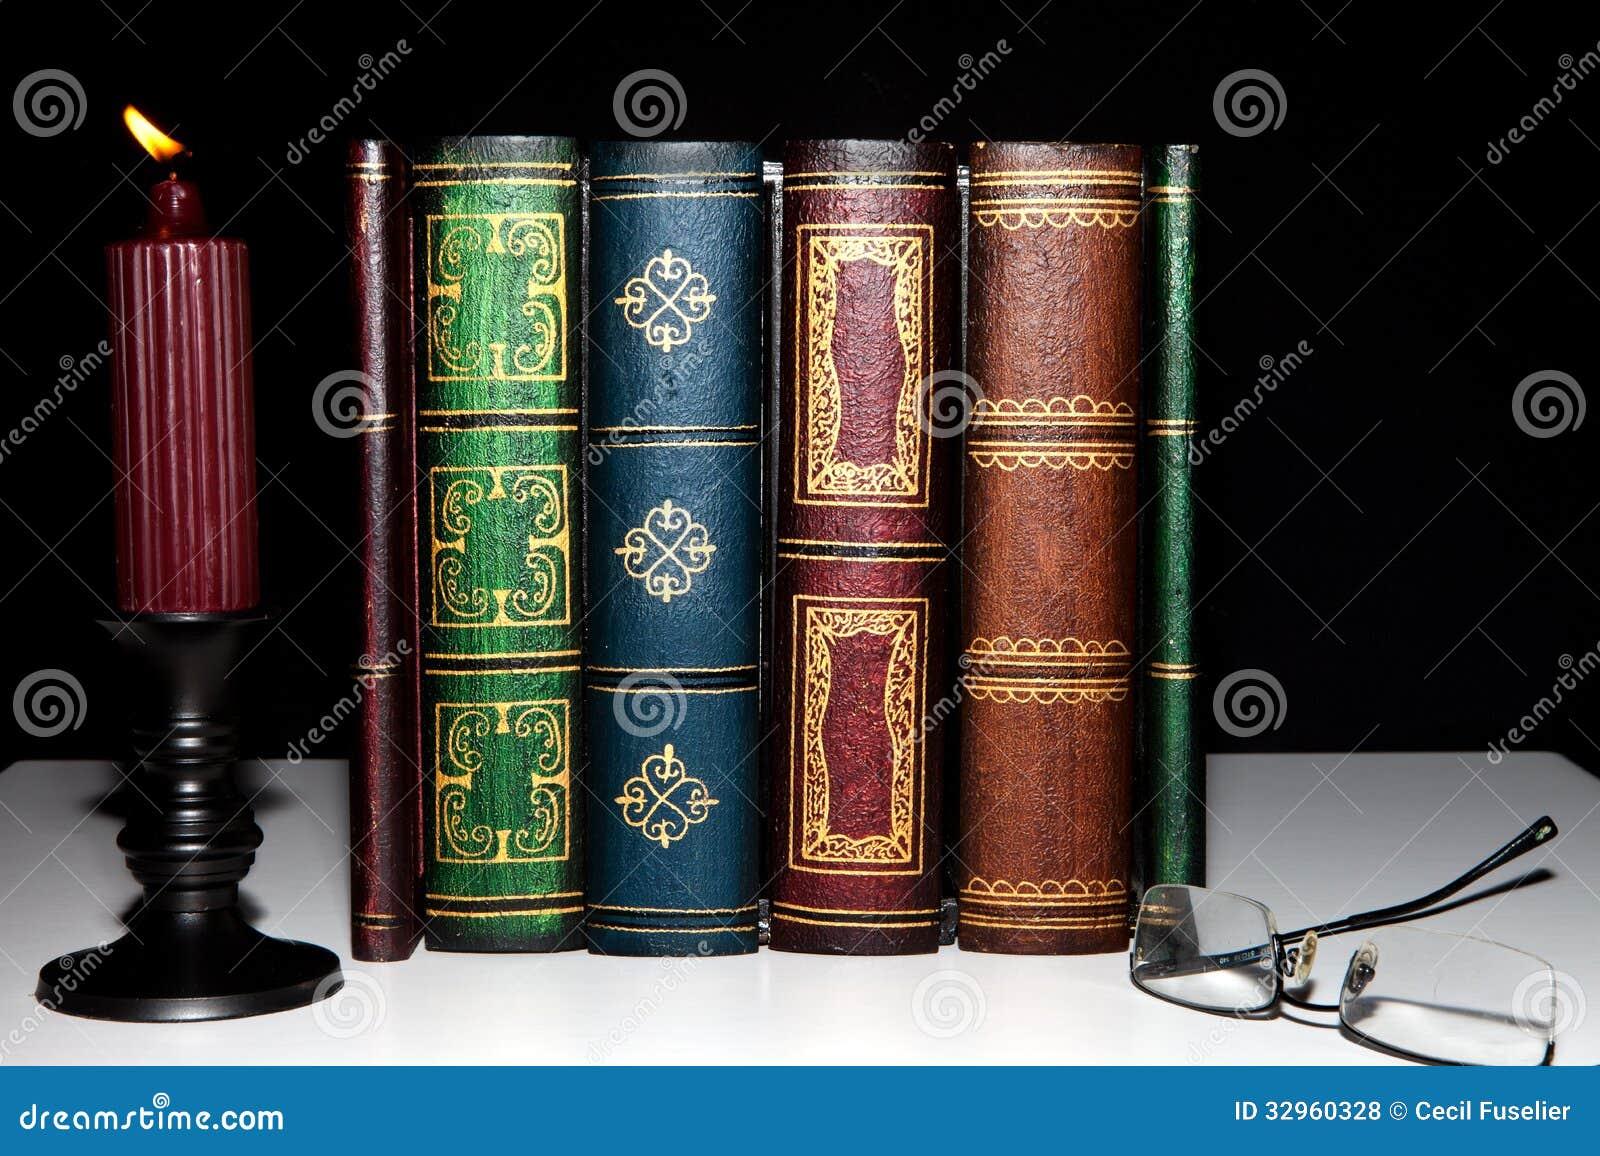 books royalty free stock photos image 32960328